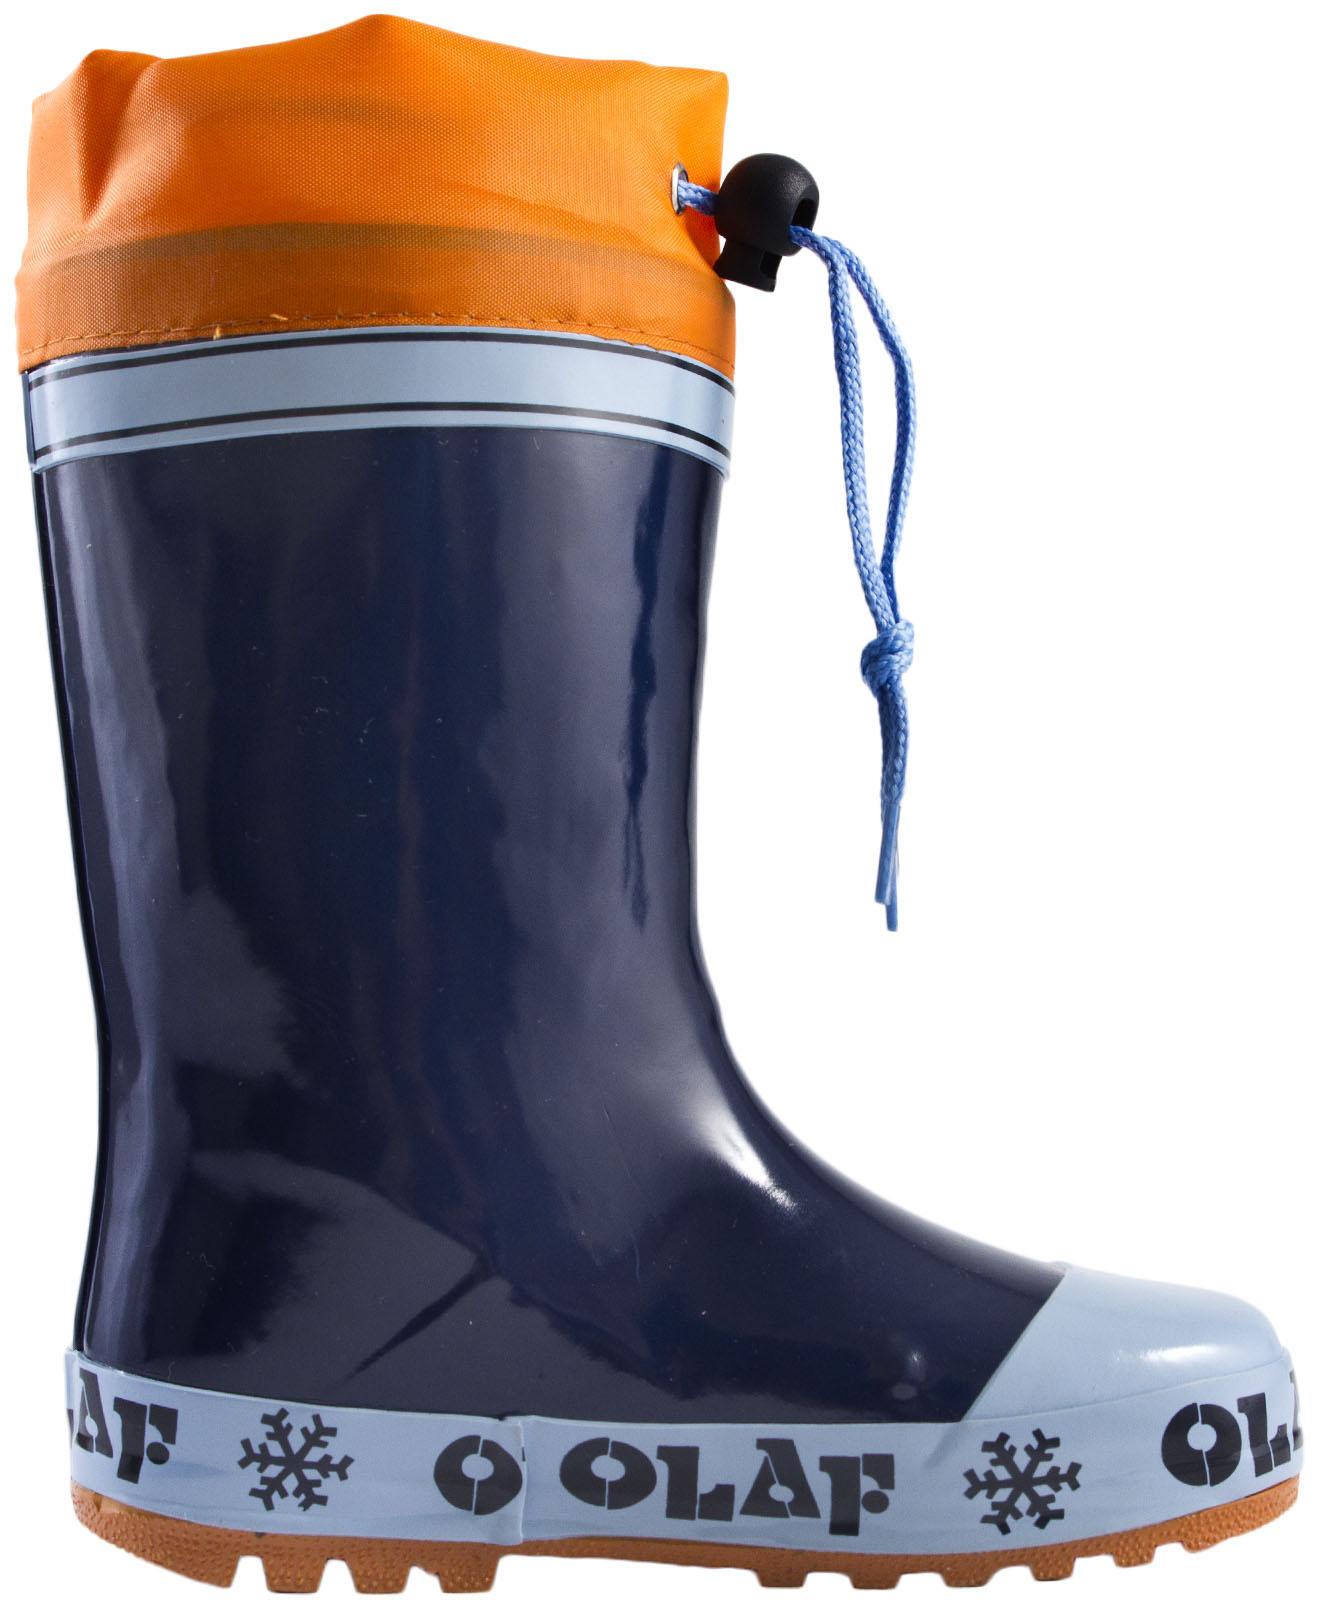 Frozen Olaf Wellington Boots Fleece Lined Rubber Tie Top Snow Wellies Boys Size